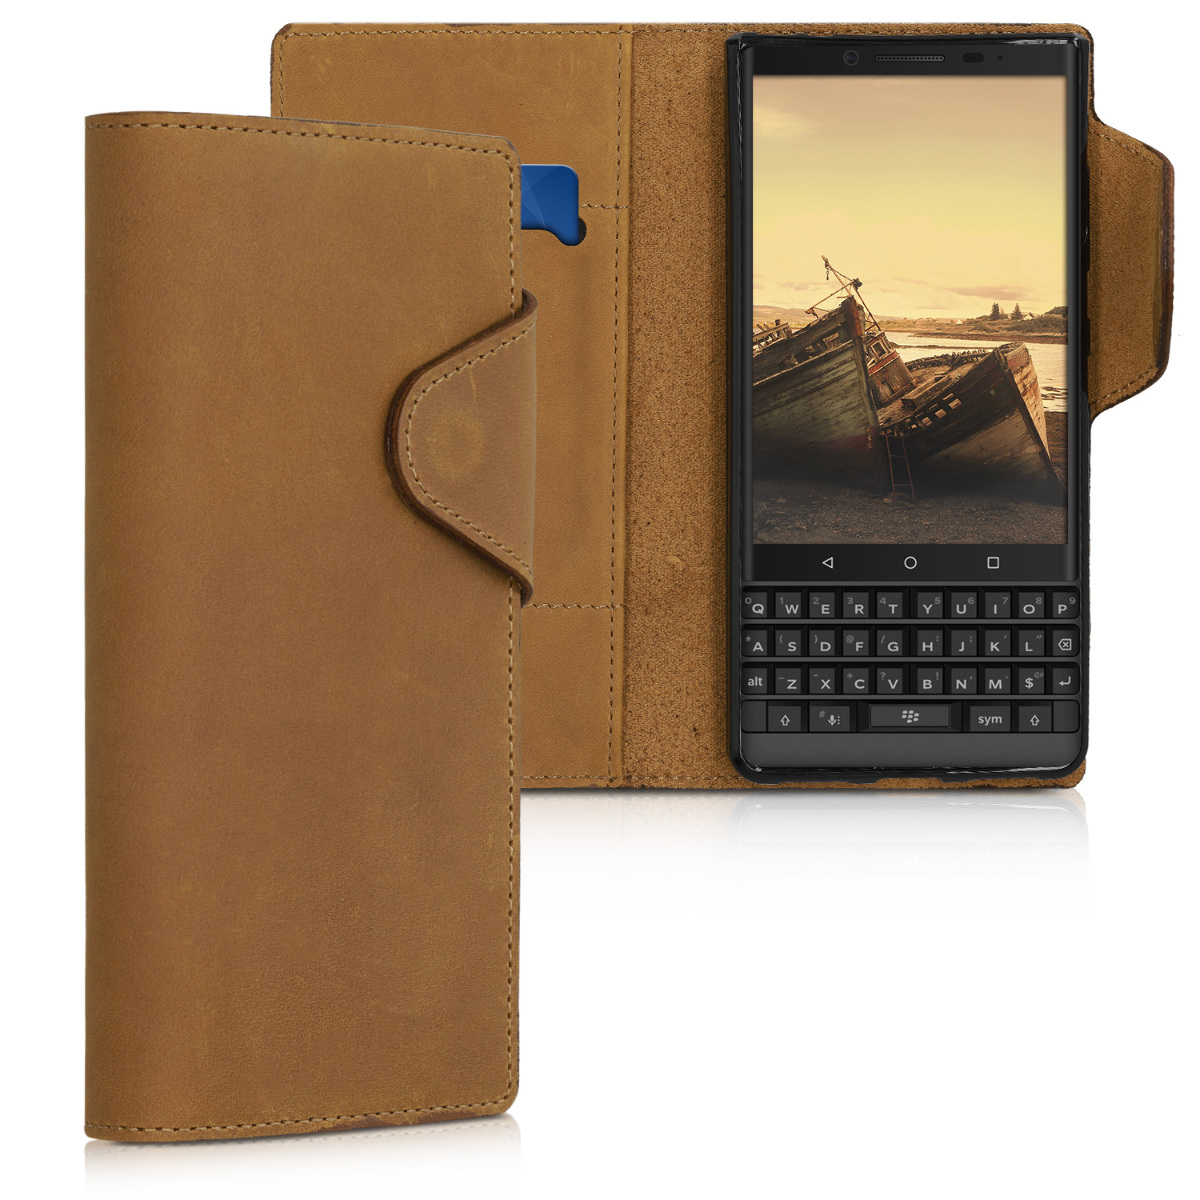 Kalibri Δερμάτινη Suede Θήκη - Πορτοφόλι Blackberry Key2 LE - Light Brown (47113.24)